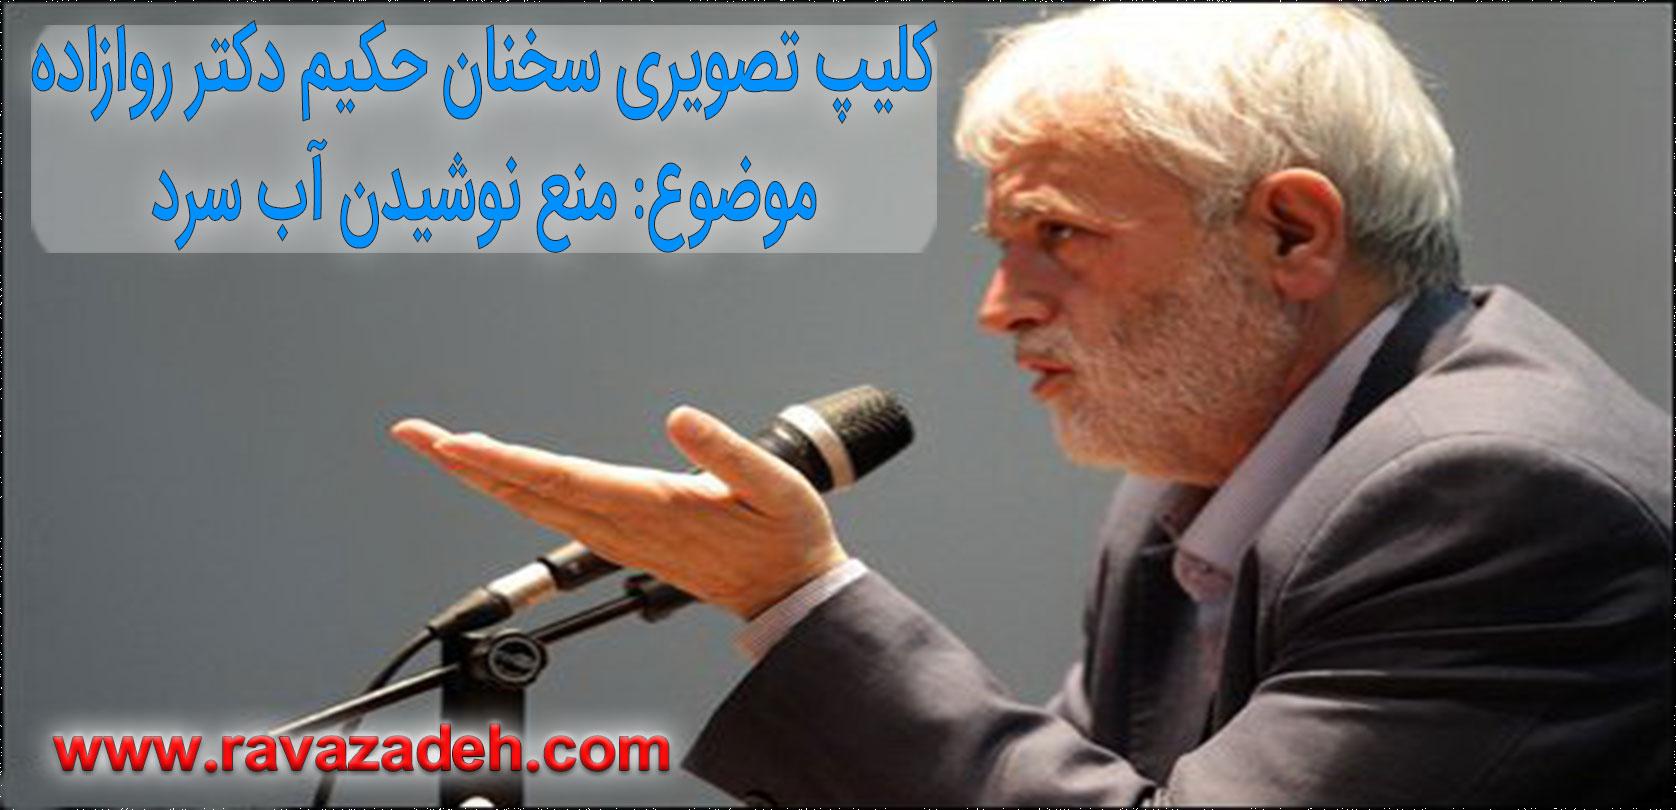 Photo of کلیپ تصویری سخنرانی حکیم دکتر روازاده: منع نوشیدن آب سرد در زمان افطار و ناشتا